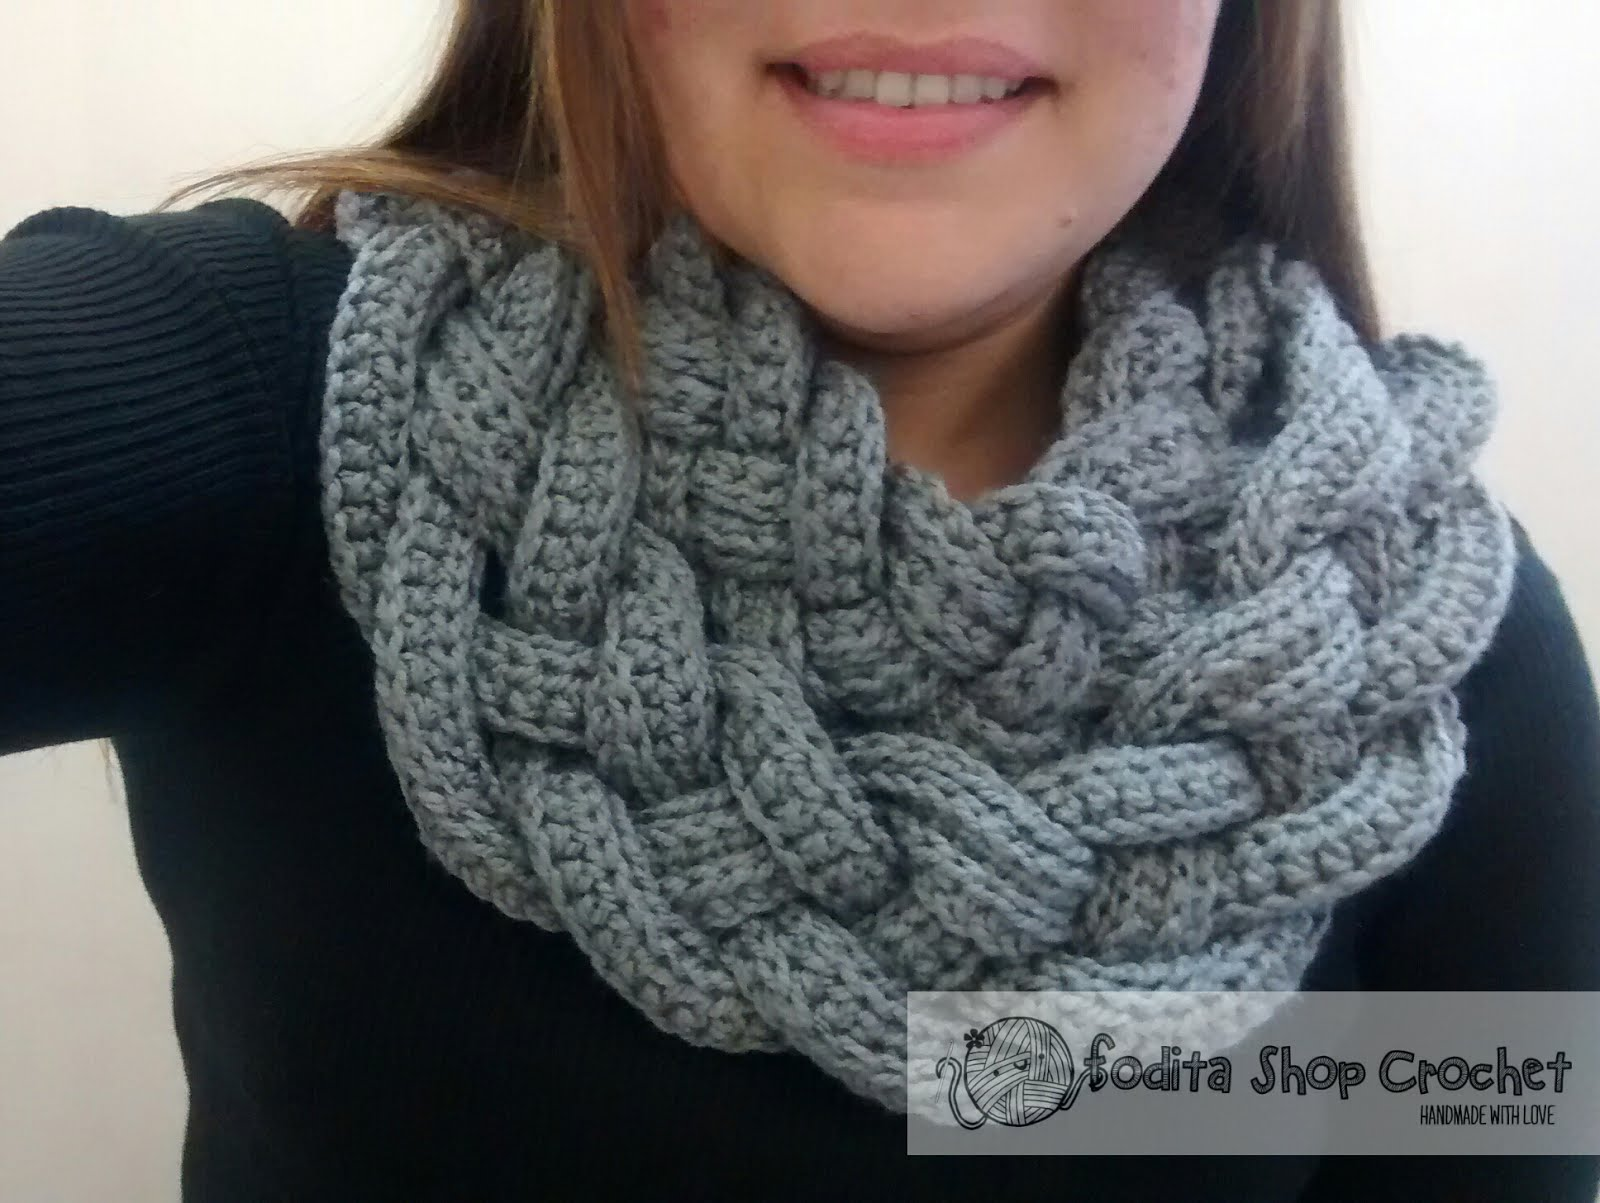 Bufanda trenzada | Fodita Shop Crochet